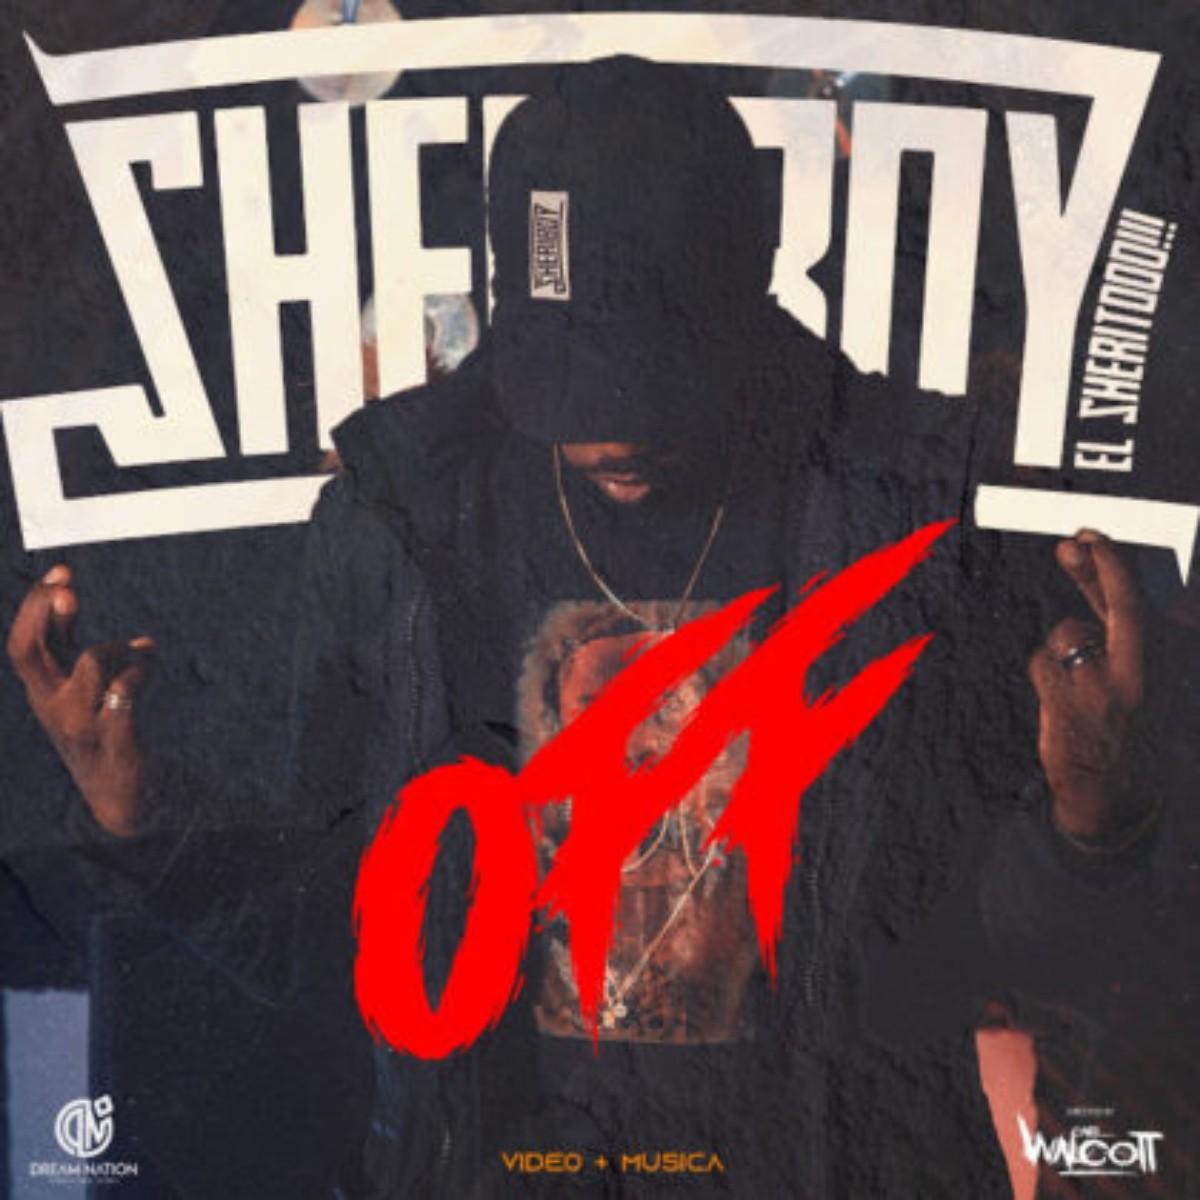 Sheriboy - Off